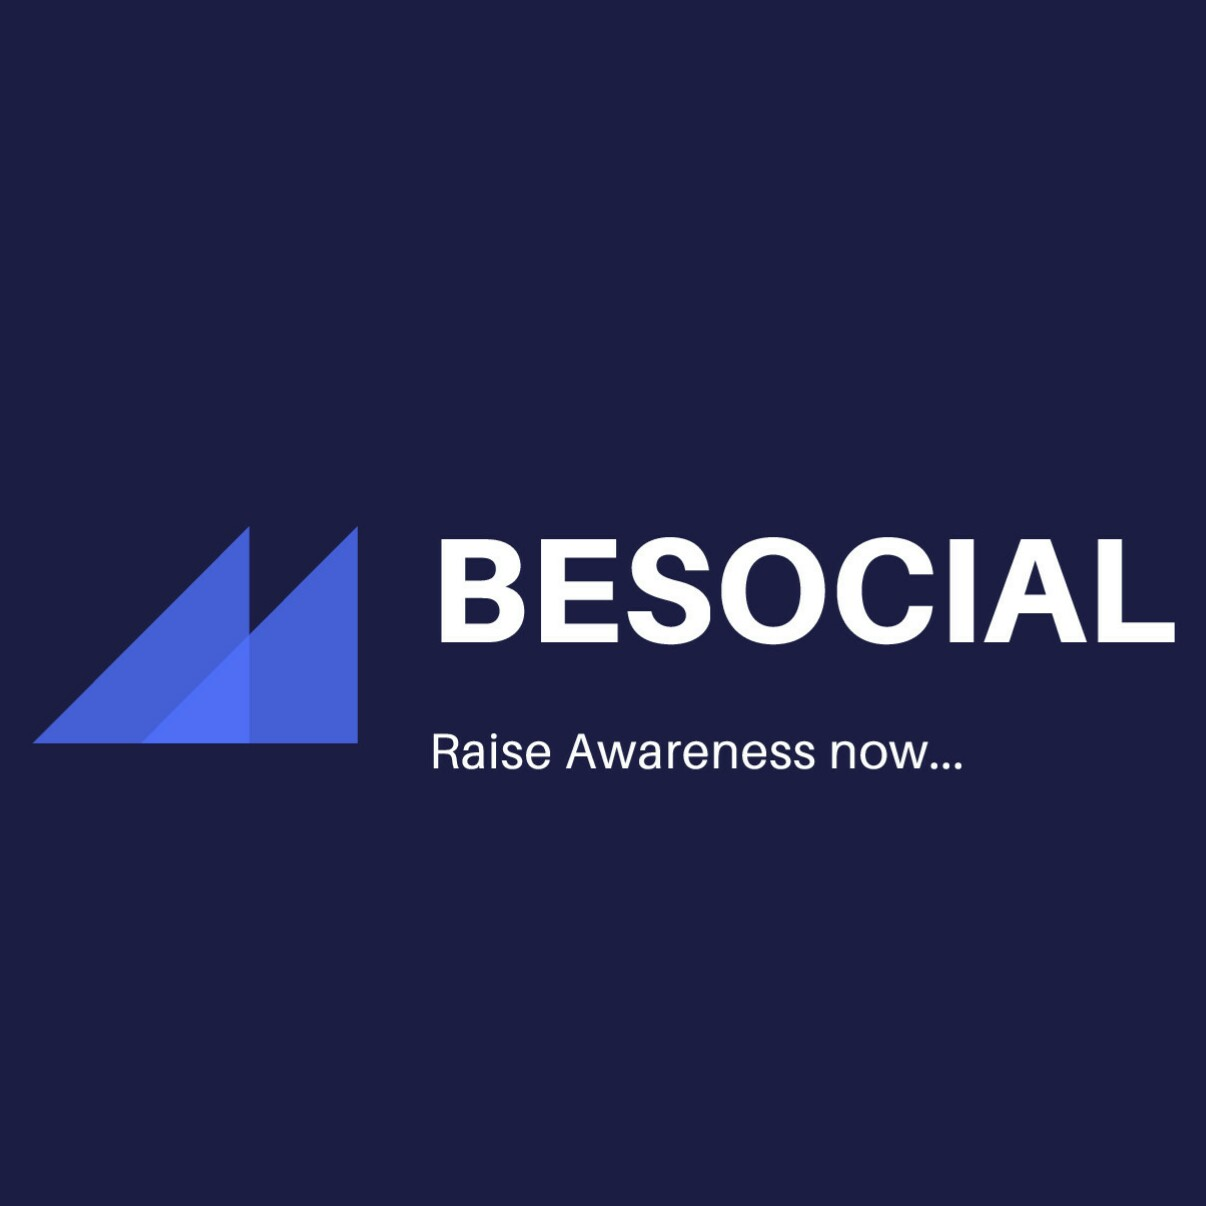 Besocial Uganda image